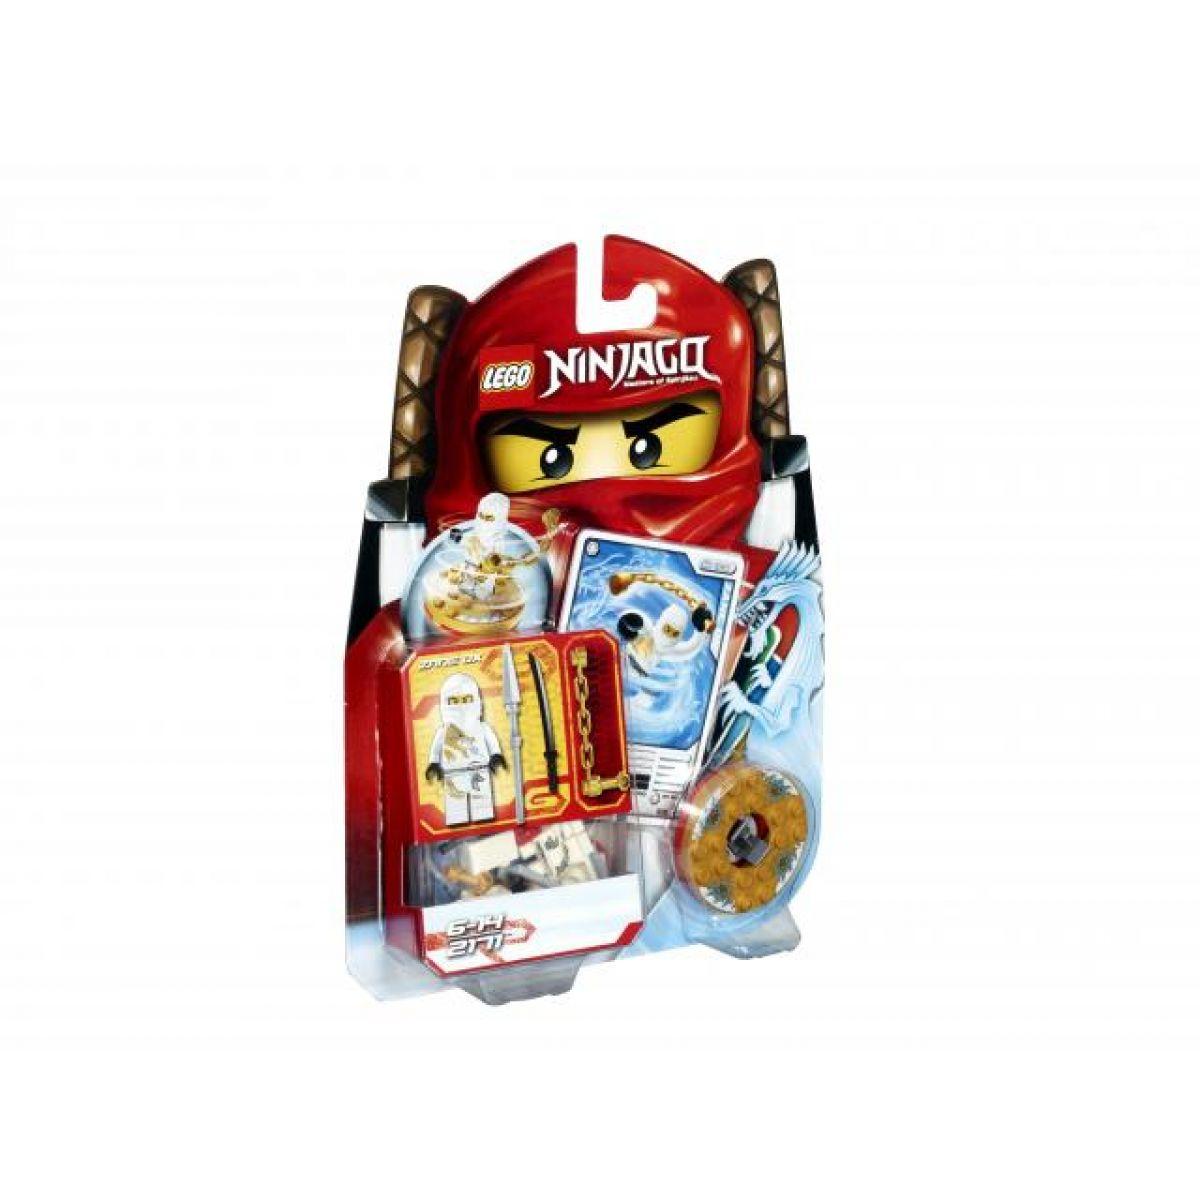 LEGO 2171 Ninjago Zane DX